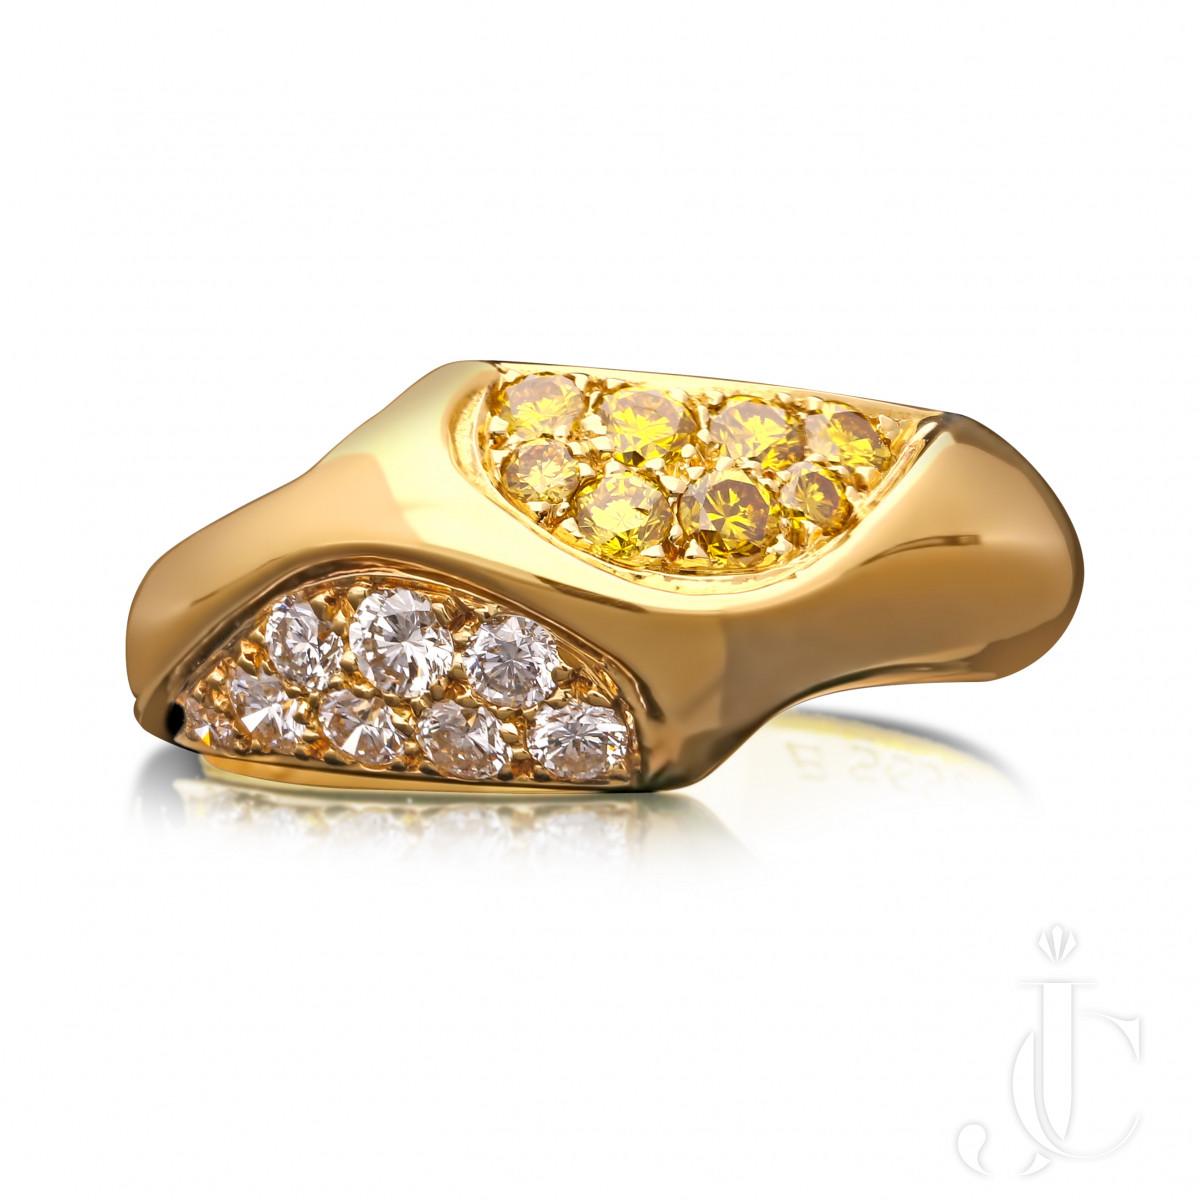 Van Cleef & Arpels Intense Fancy Yellow & White diamond ring c.1980